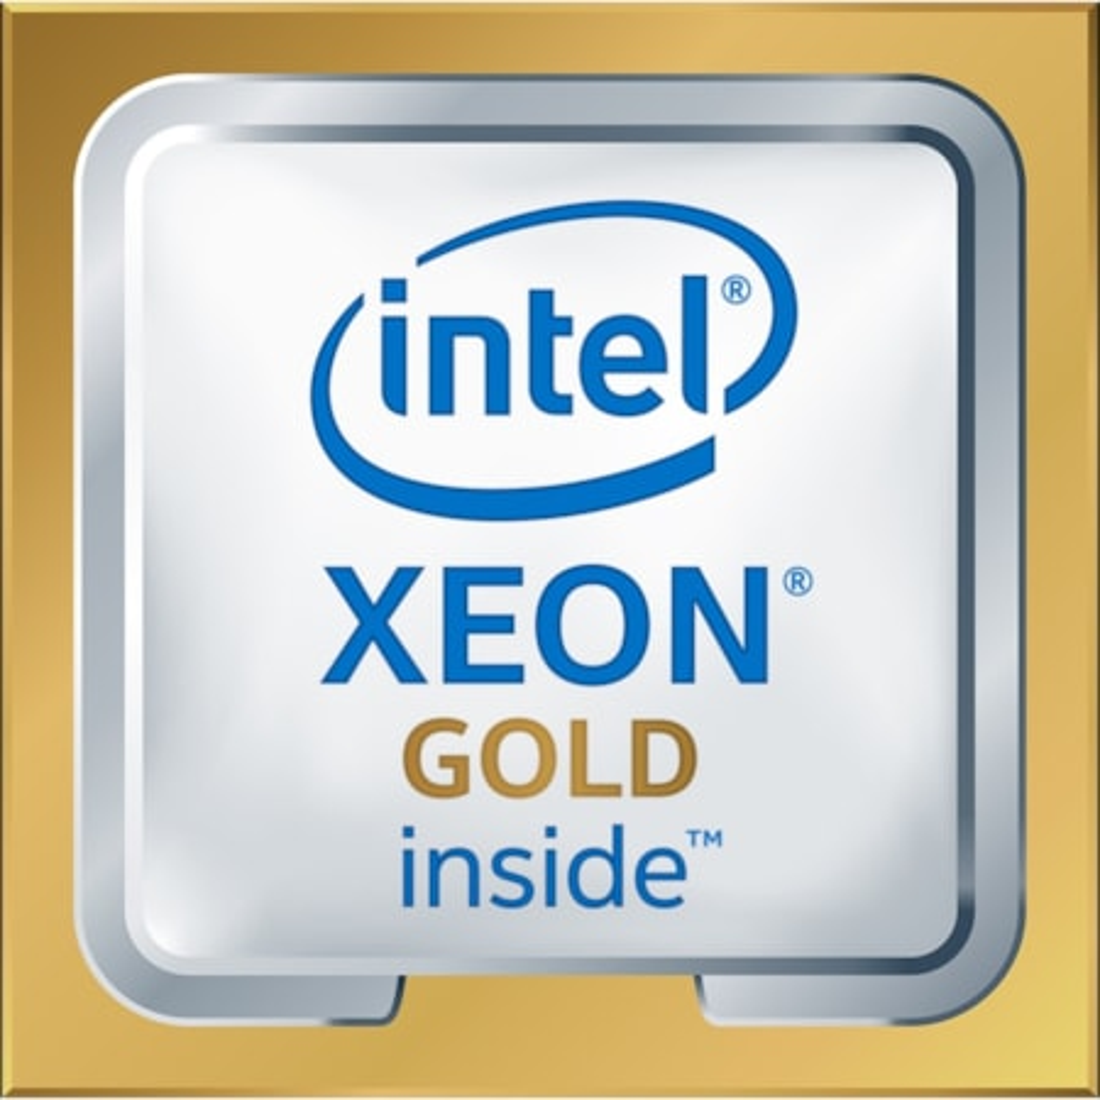 Cisco Intel Xeon Gold 6130 Hexadeca-core (16 Core) 2.10 GHz Processor Upgrade